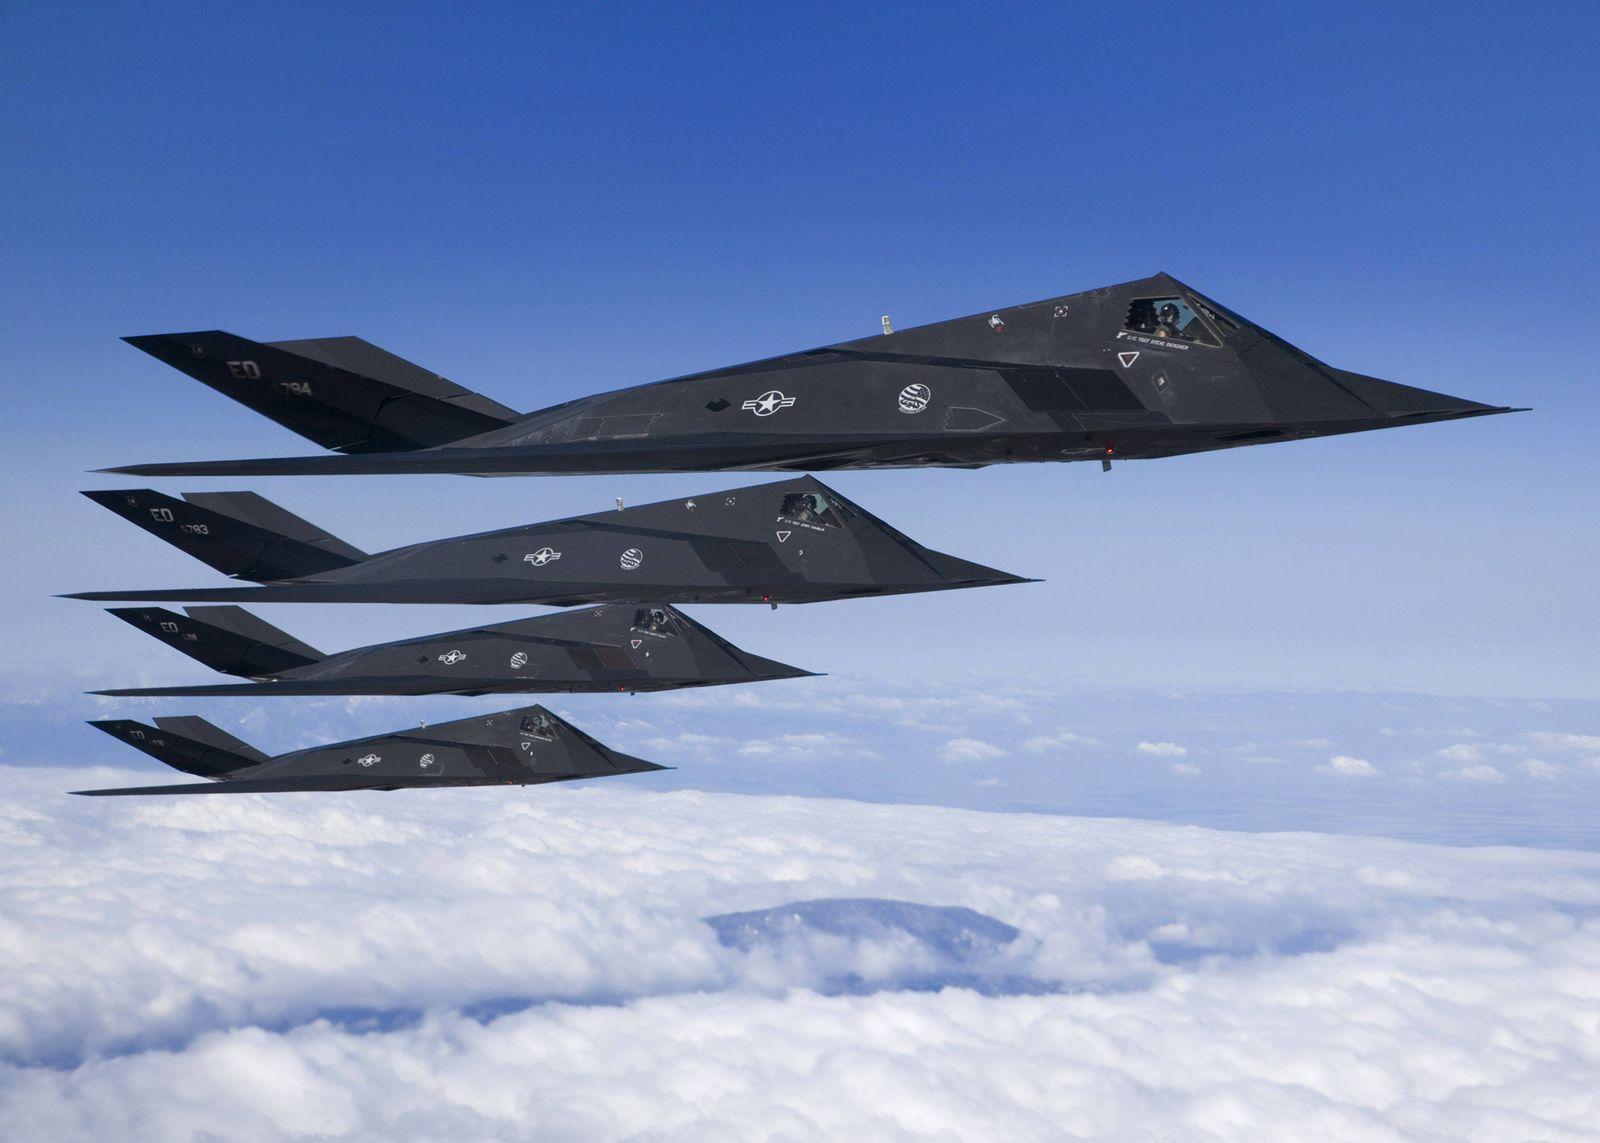 March 28, 2007 - CA, United States - Four U.S Air Force F-117 Nighthawk aircraft fly in formation du